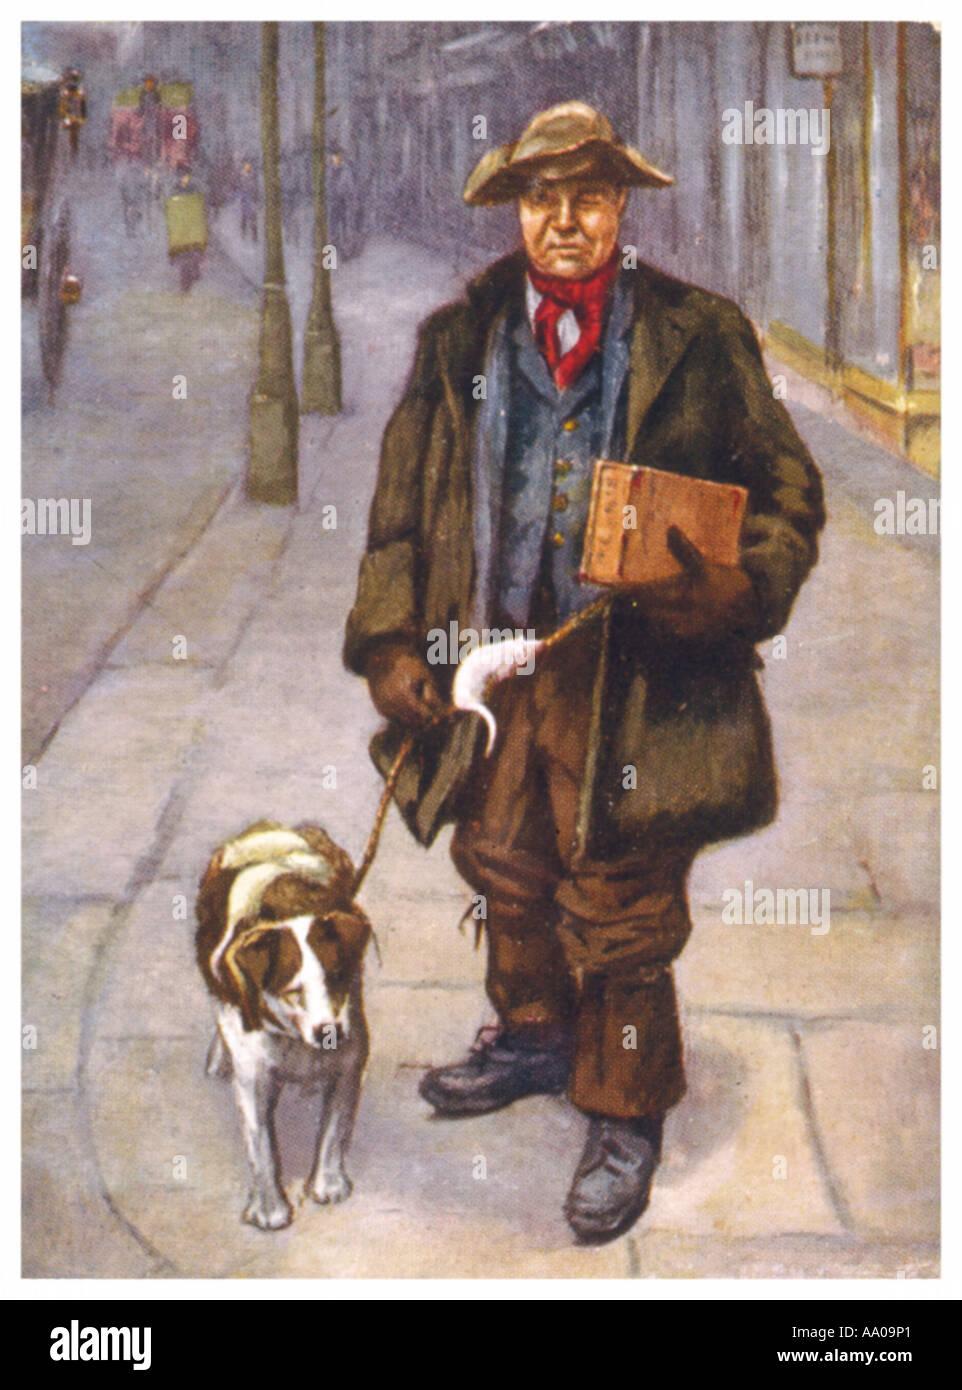 Rat Catcher And Dog - Stock Image